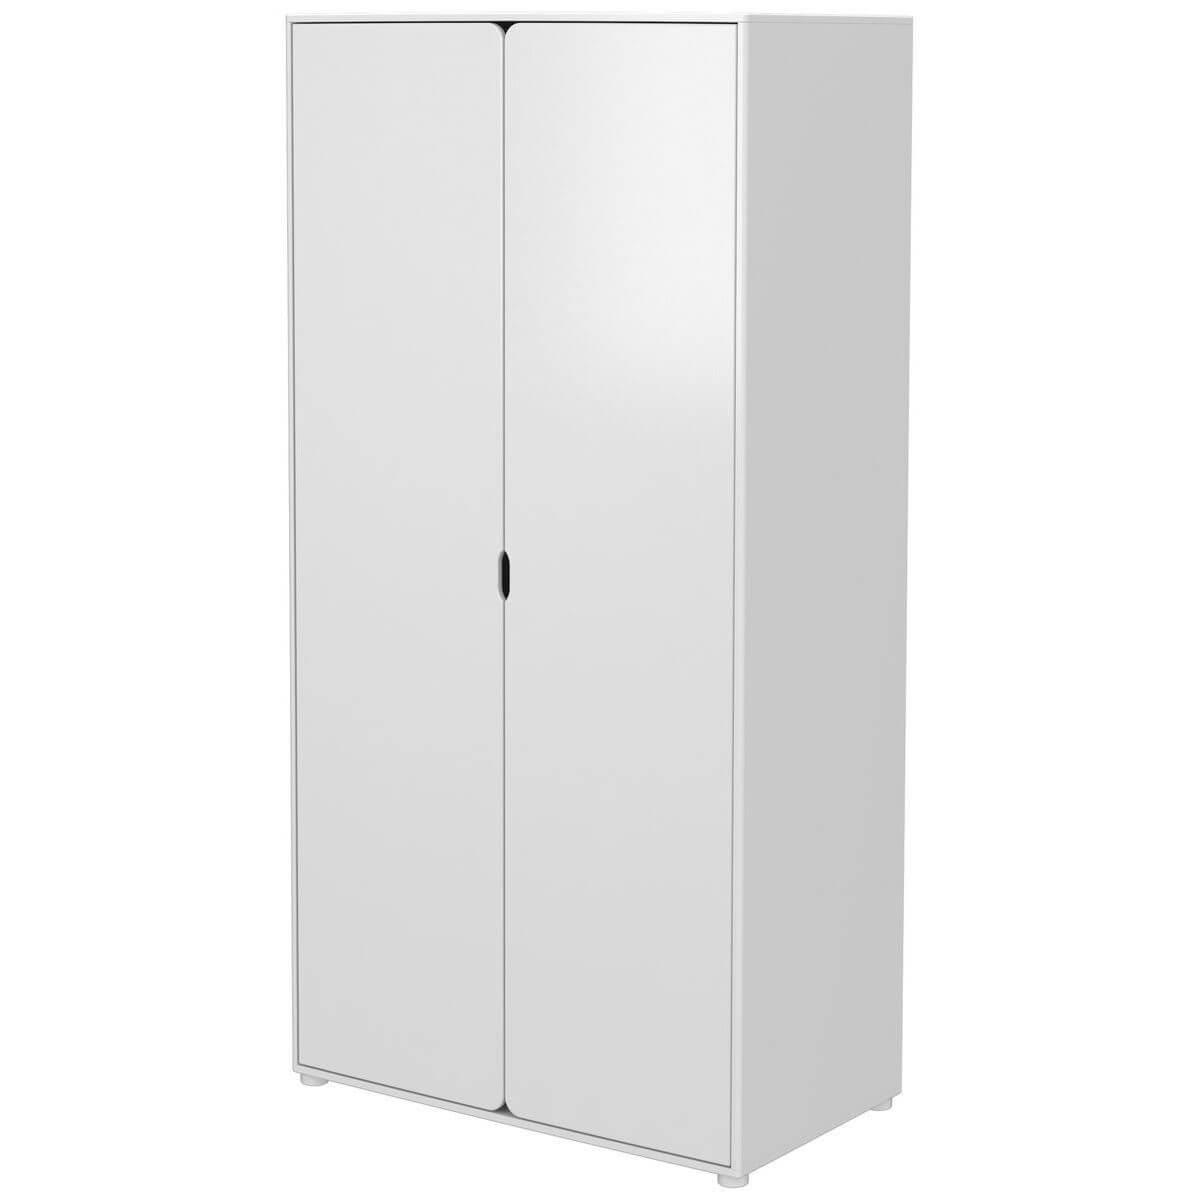 Armario infantil extra alto 2 puertas 4 estantes 1 barra CABBY Flexa blanco